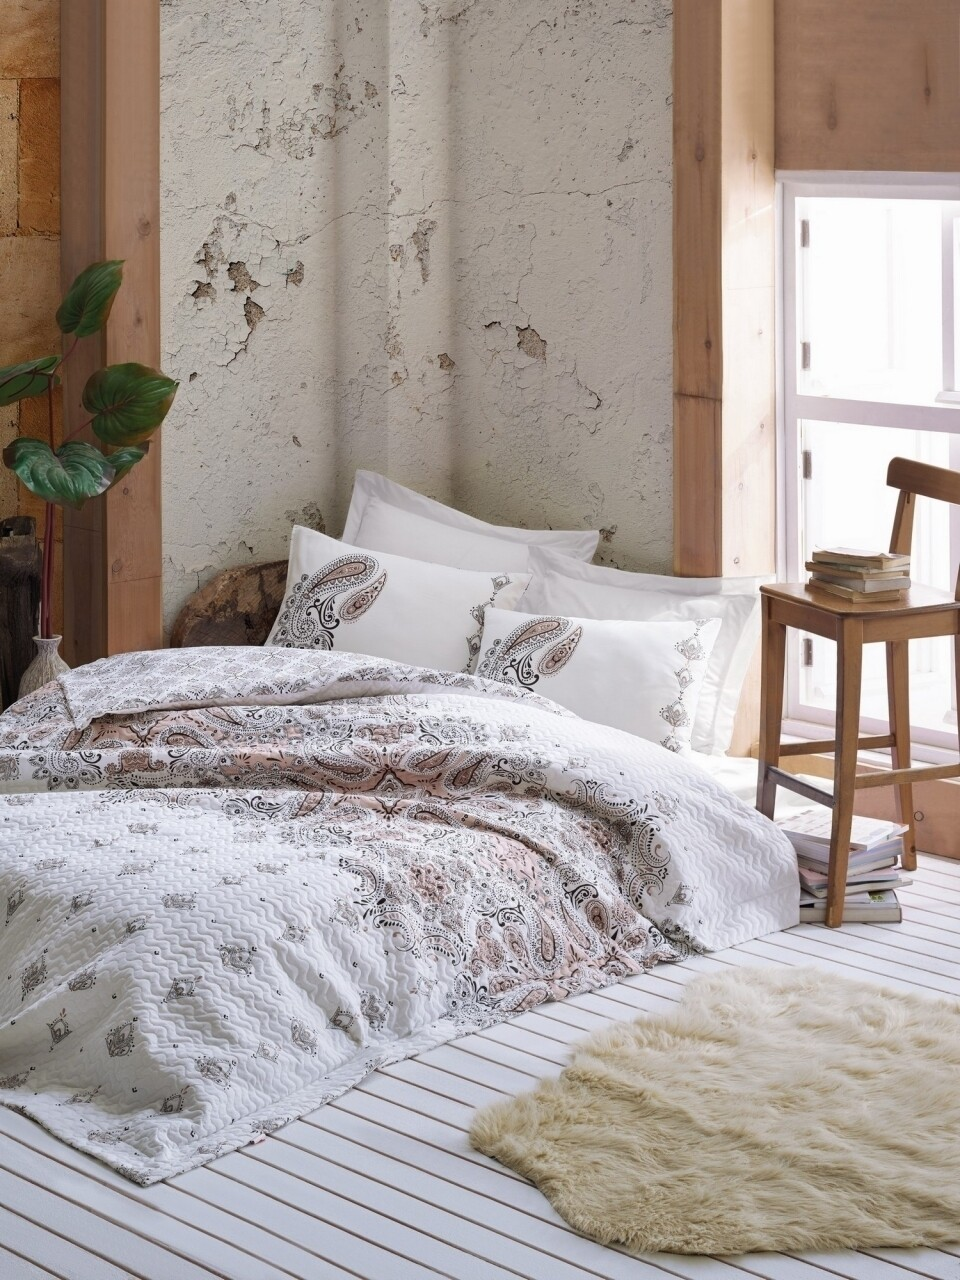 Lenjerie de pat matlasata pentru o persoana, 3 piese, 100% bumbac ranforce, Cotton Box, Harley Beige